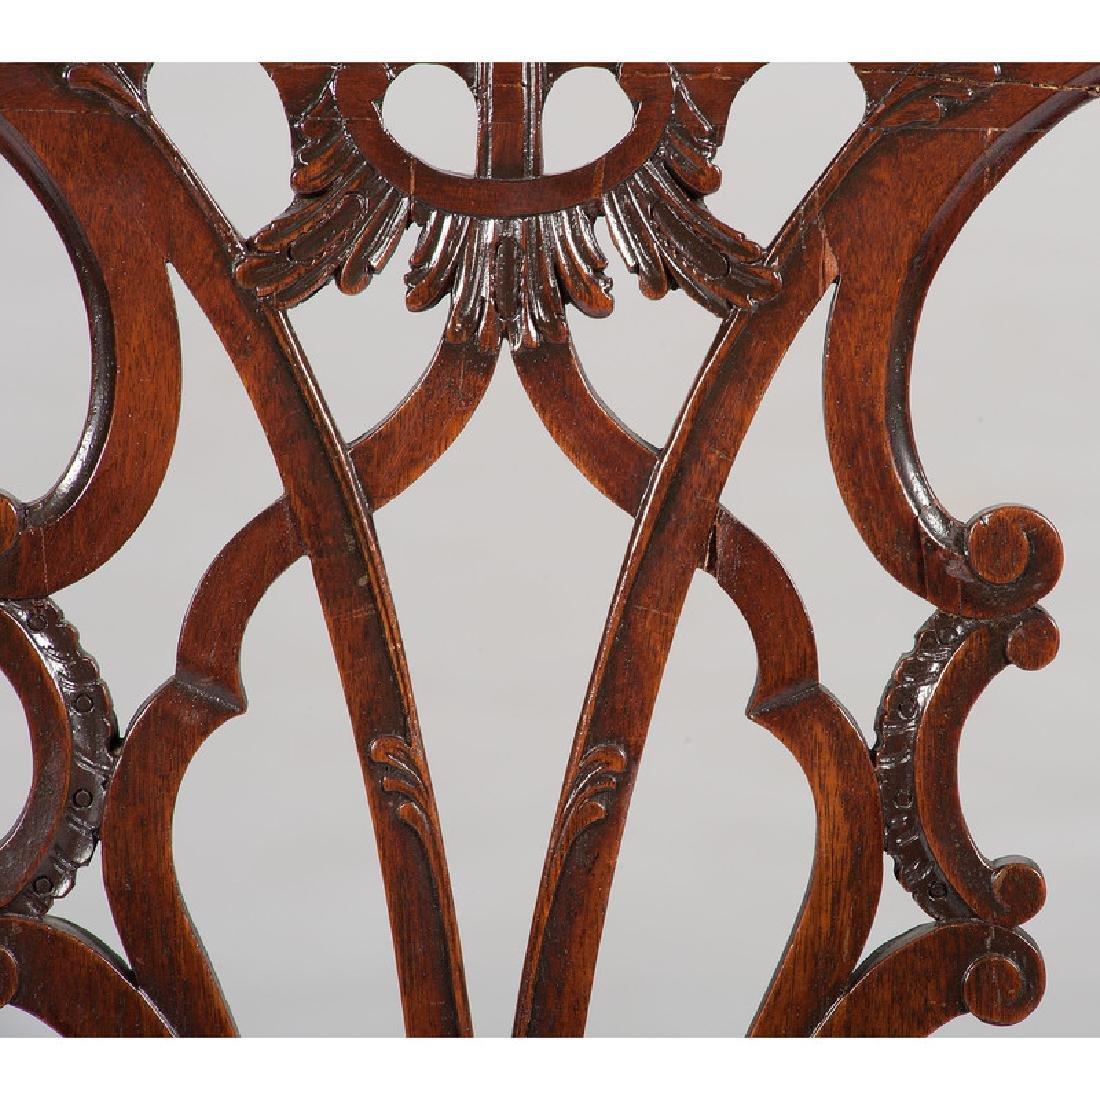 Twelve George III Chippendale Chairs - 6